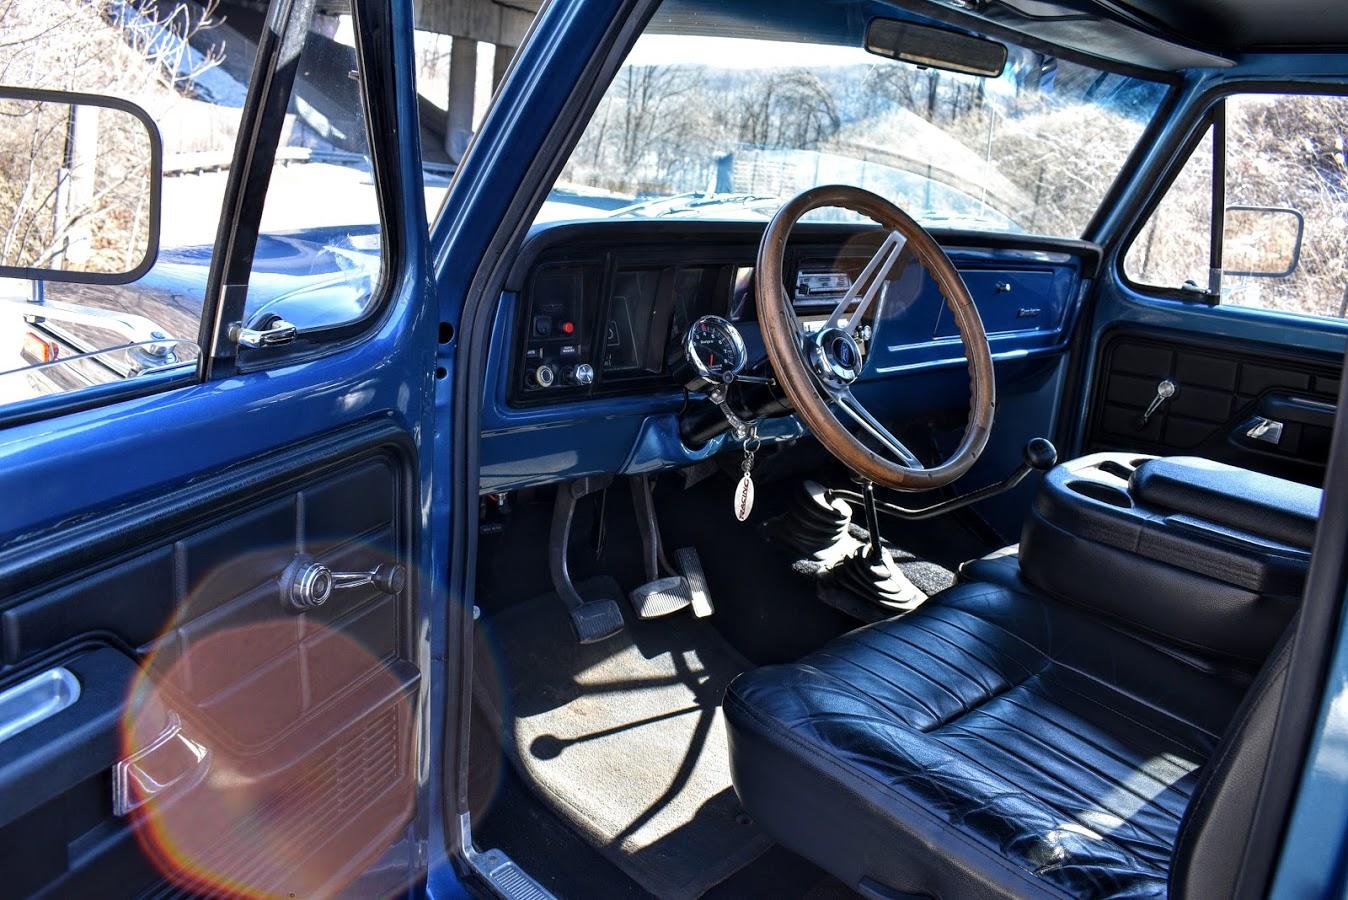 1973 Ford F250 Highboy With Wood Deck Bed 8.JPG